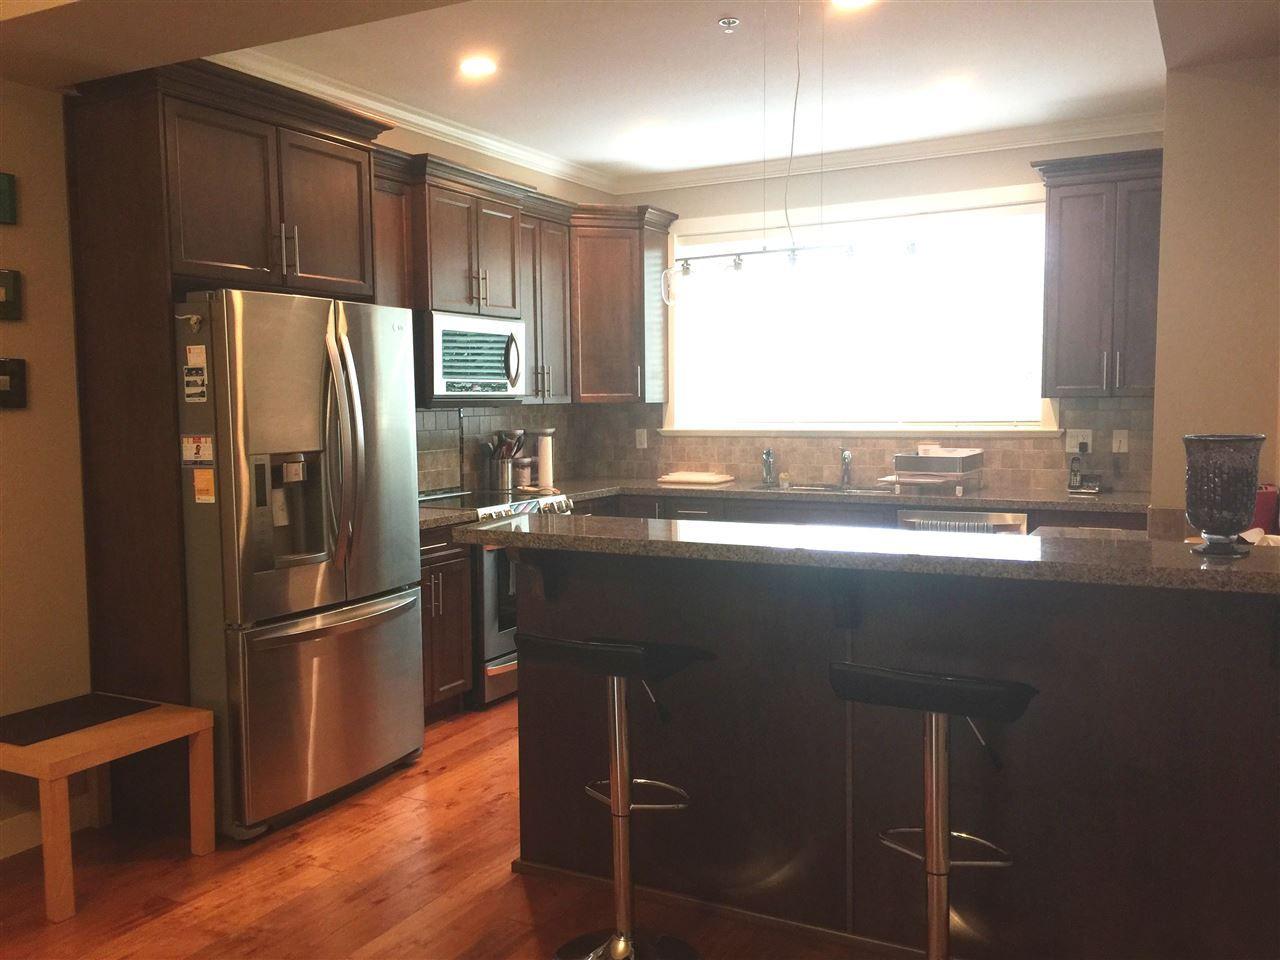 Main Photo: 80 11252 COTTONWOOD Drive in Maple Ridge: Cottonwood MR Townhouse for sale : MLS®# R2177246